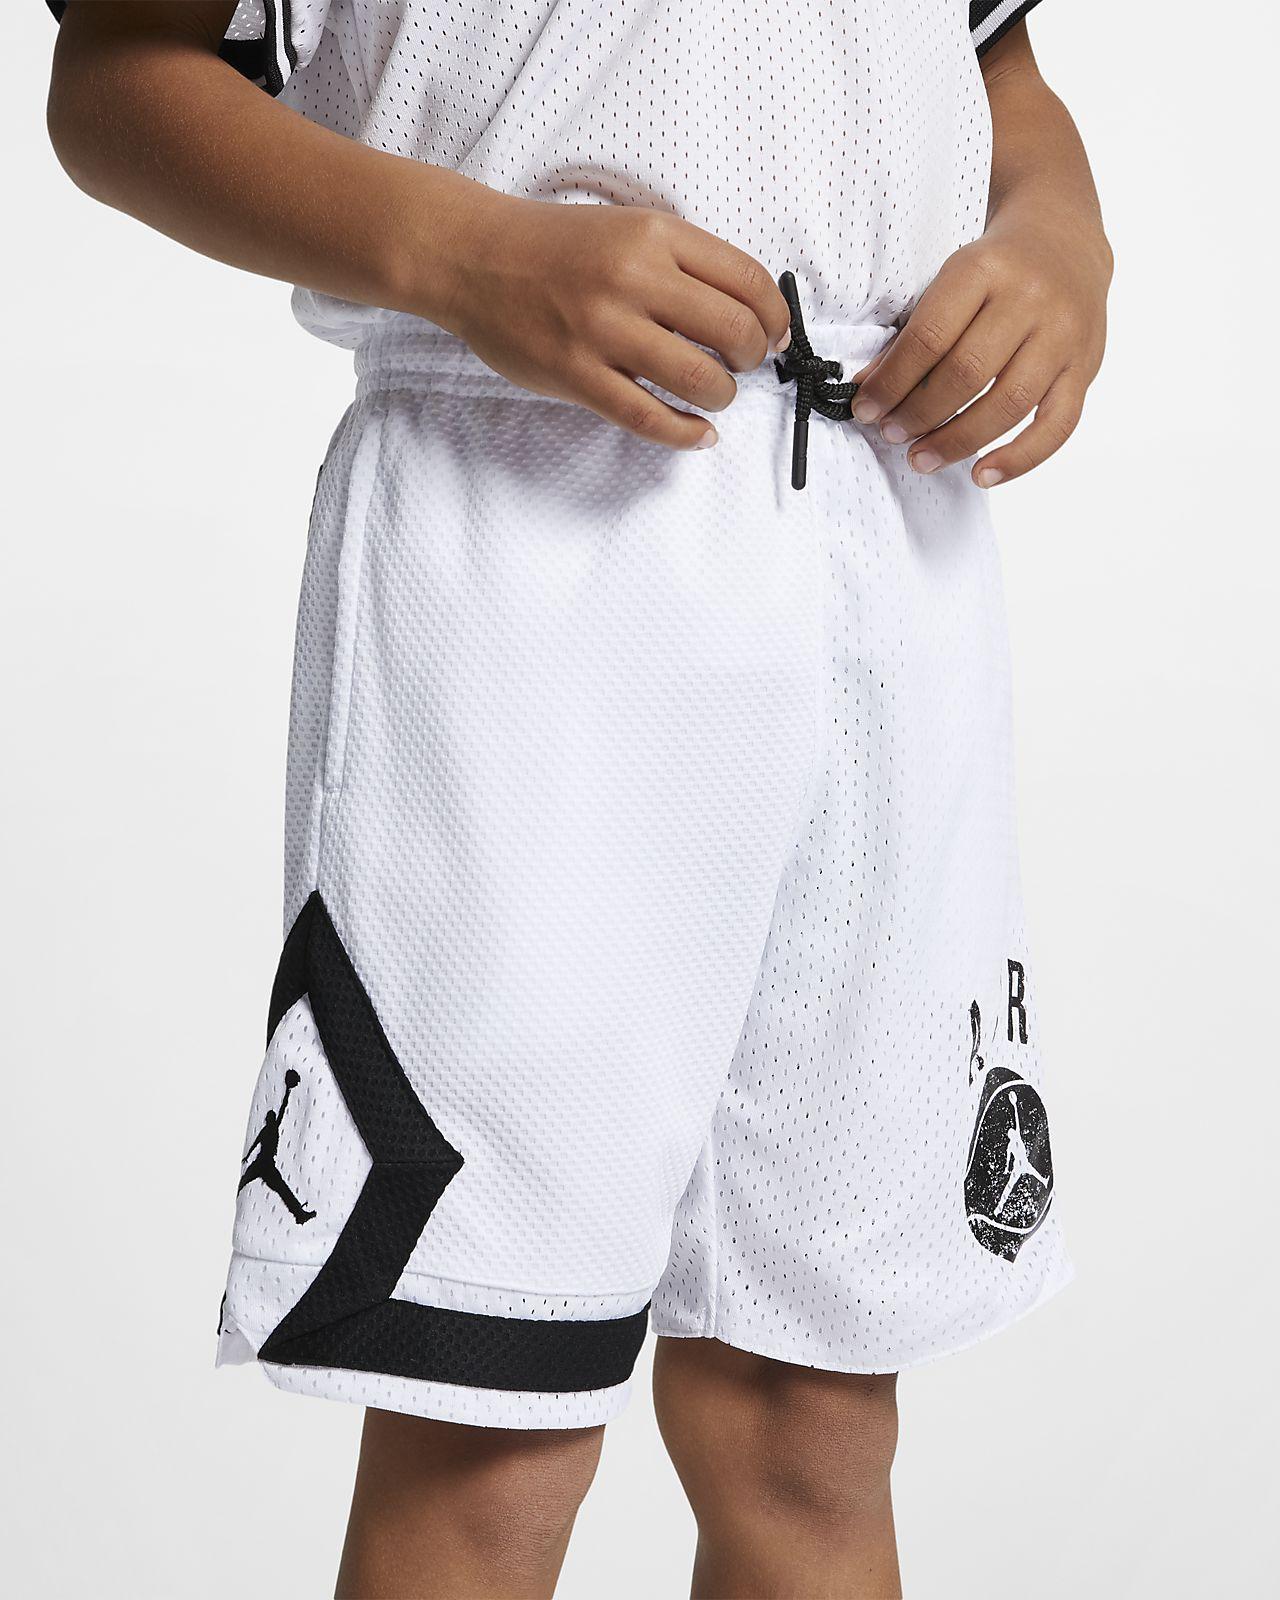 Jordan Dri-FIT Younger Kids' Shorts